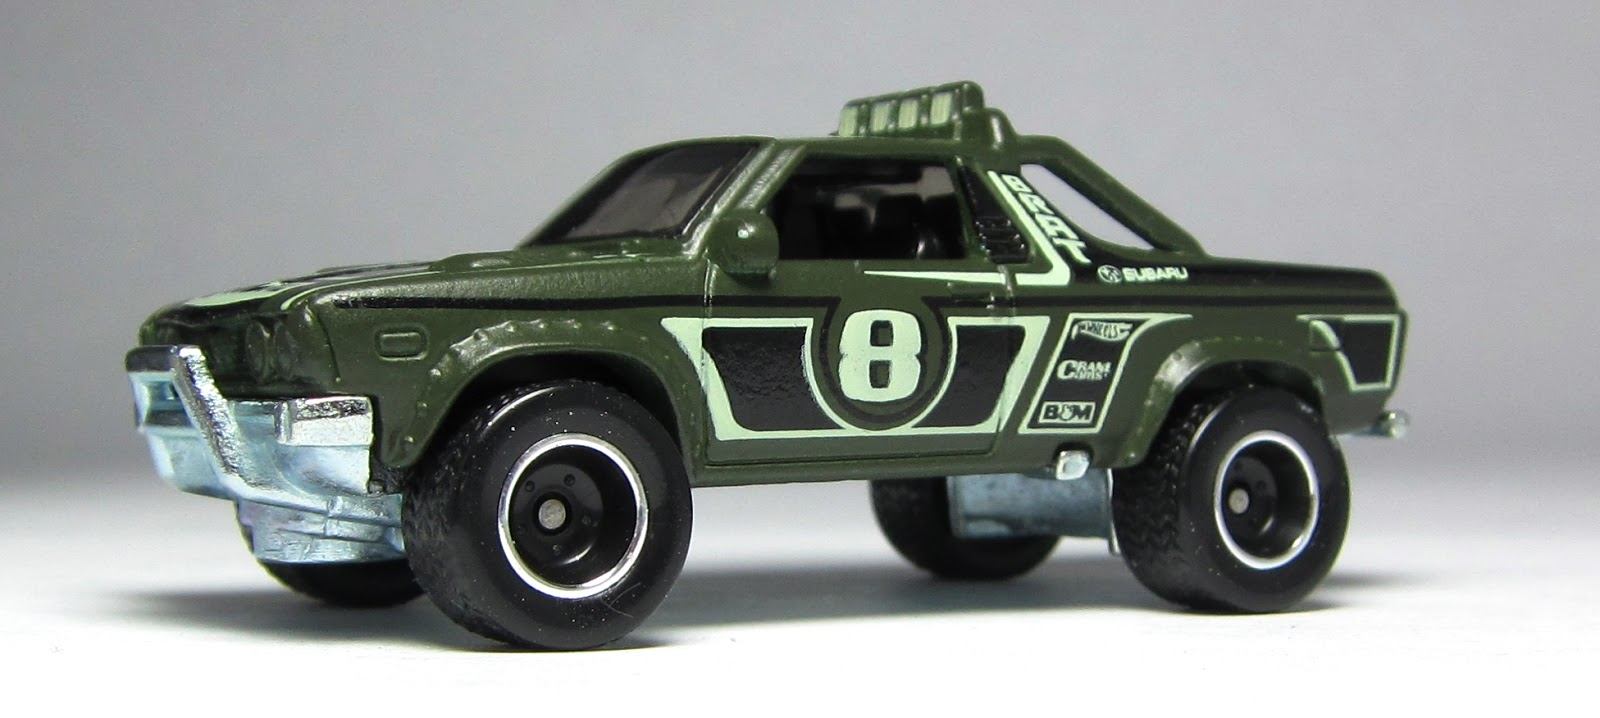 Subaru brat 2013